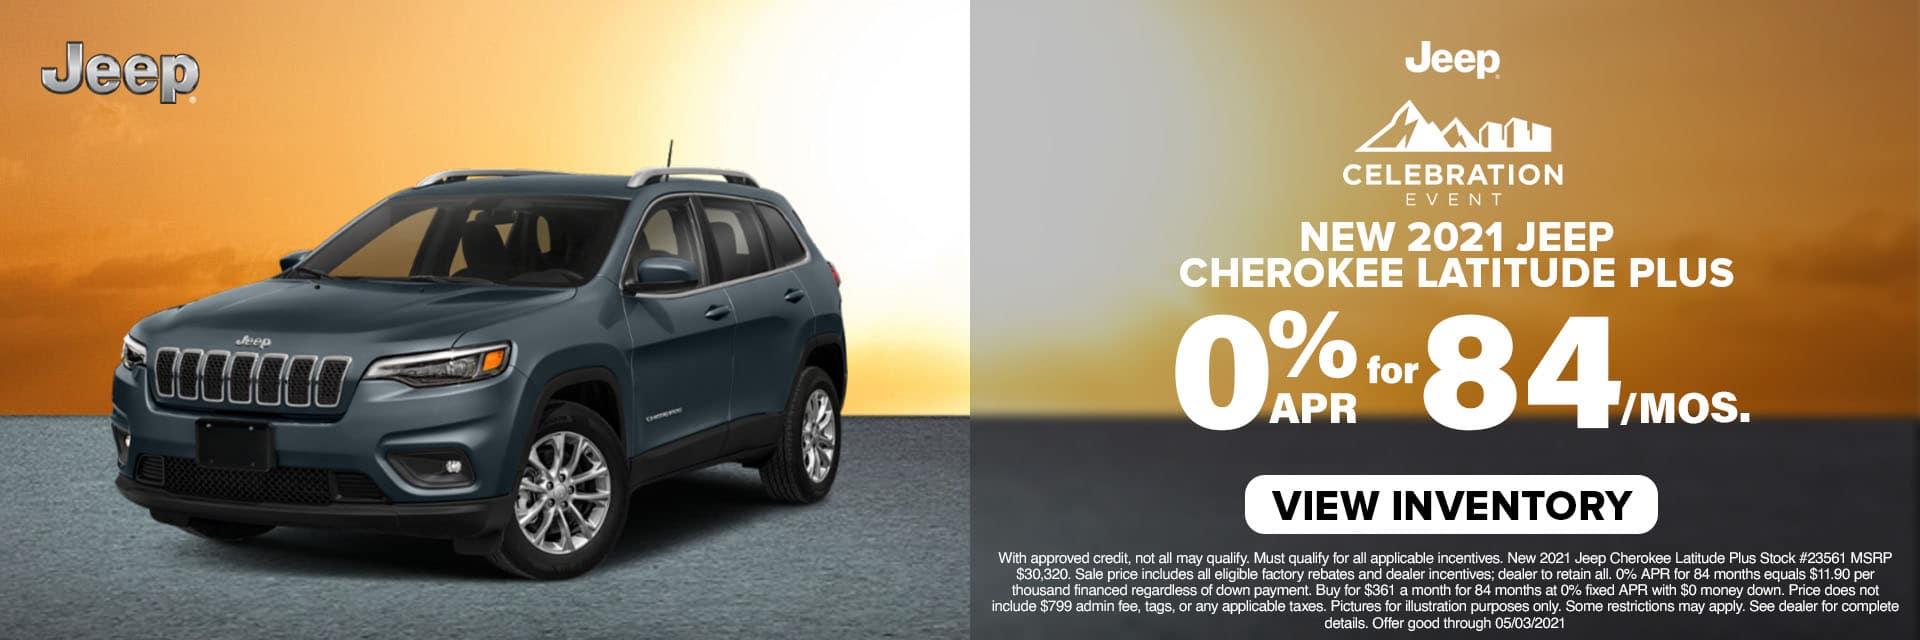 CLCP-April 2021-2020 Jeep Cherokee